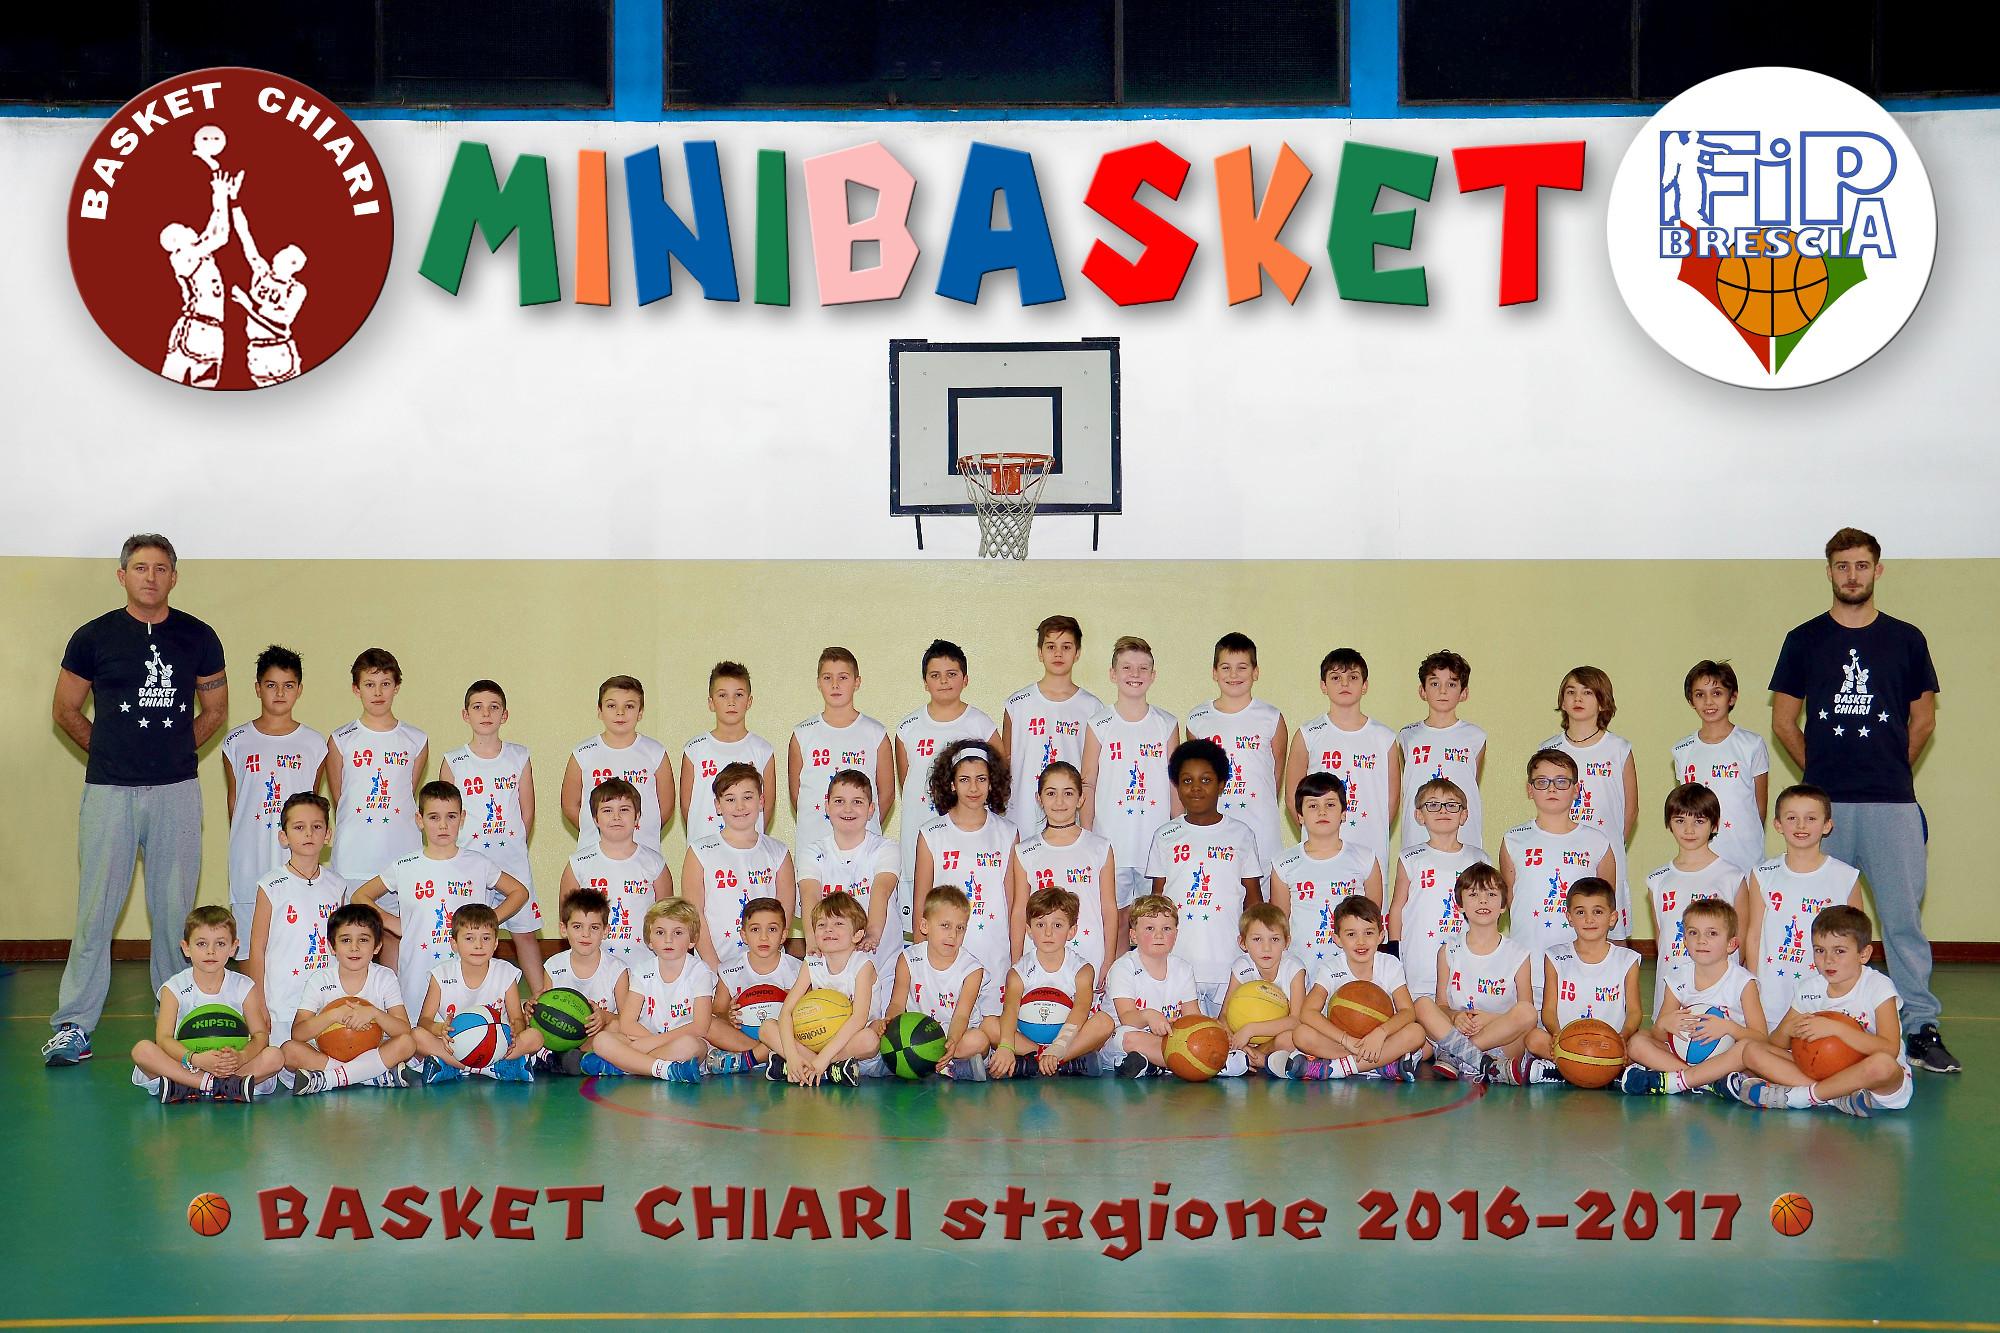 Basket Chiari - Minibasket - 20165/2017